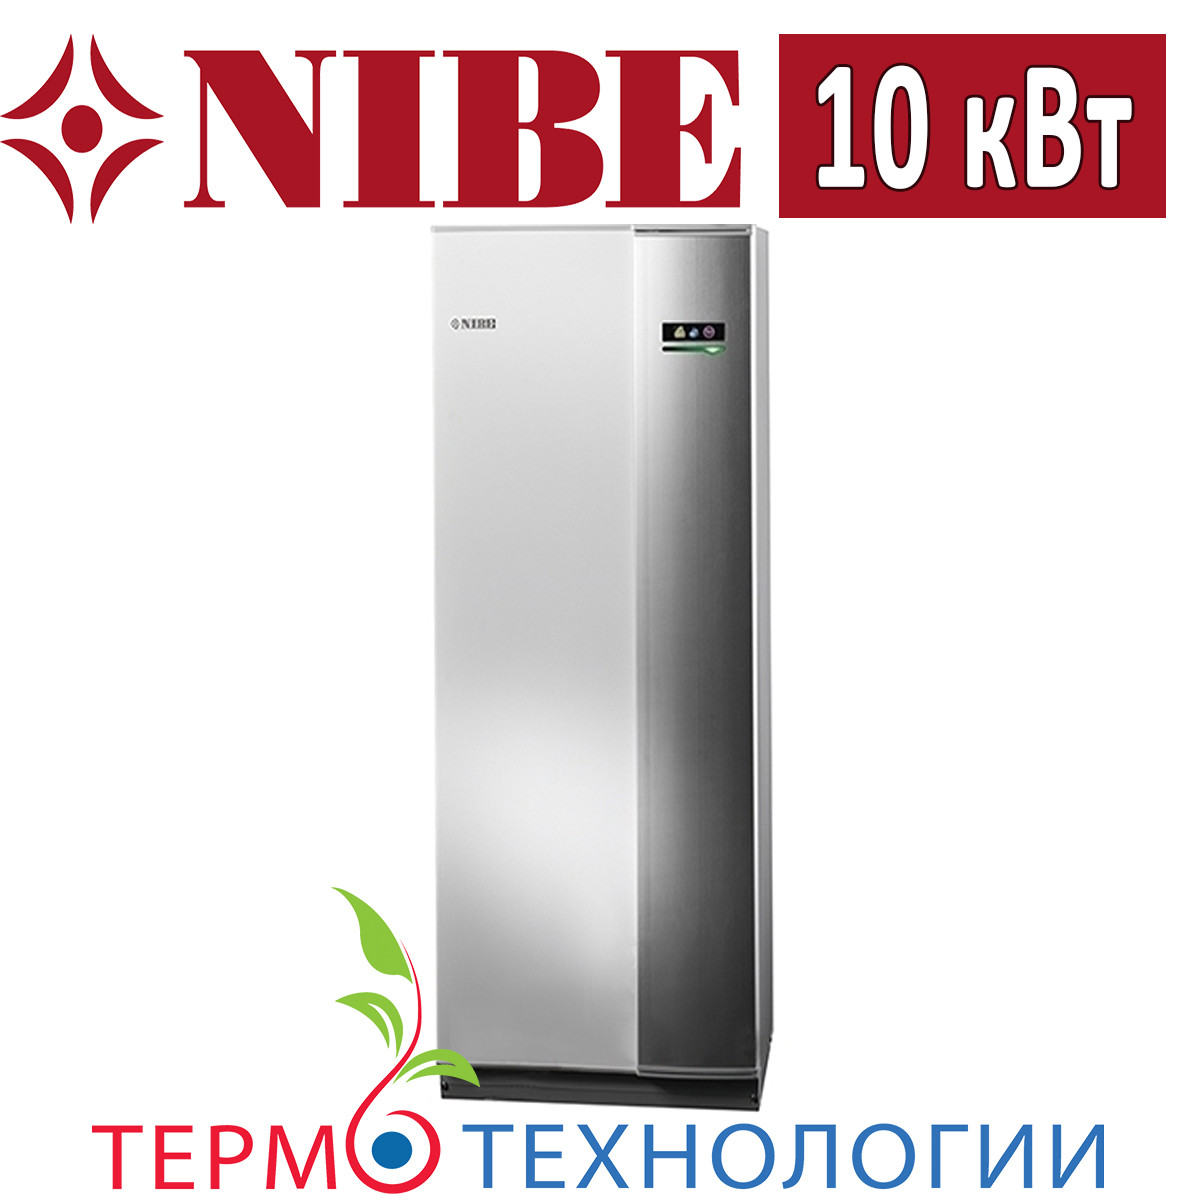 Тепловой насос грунт-вода Nibe F1145 10 кВт, 230 В